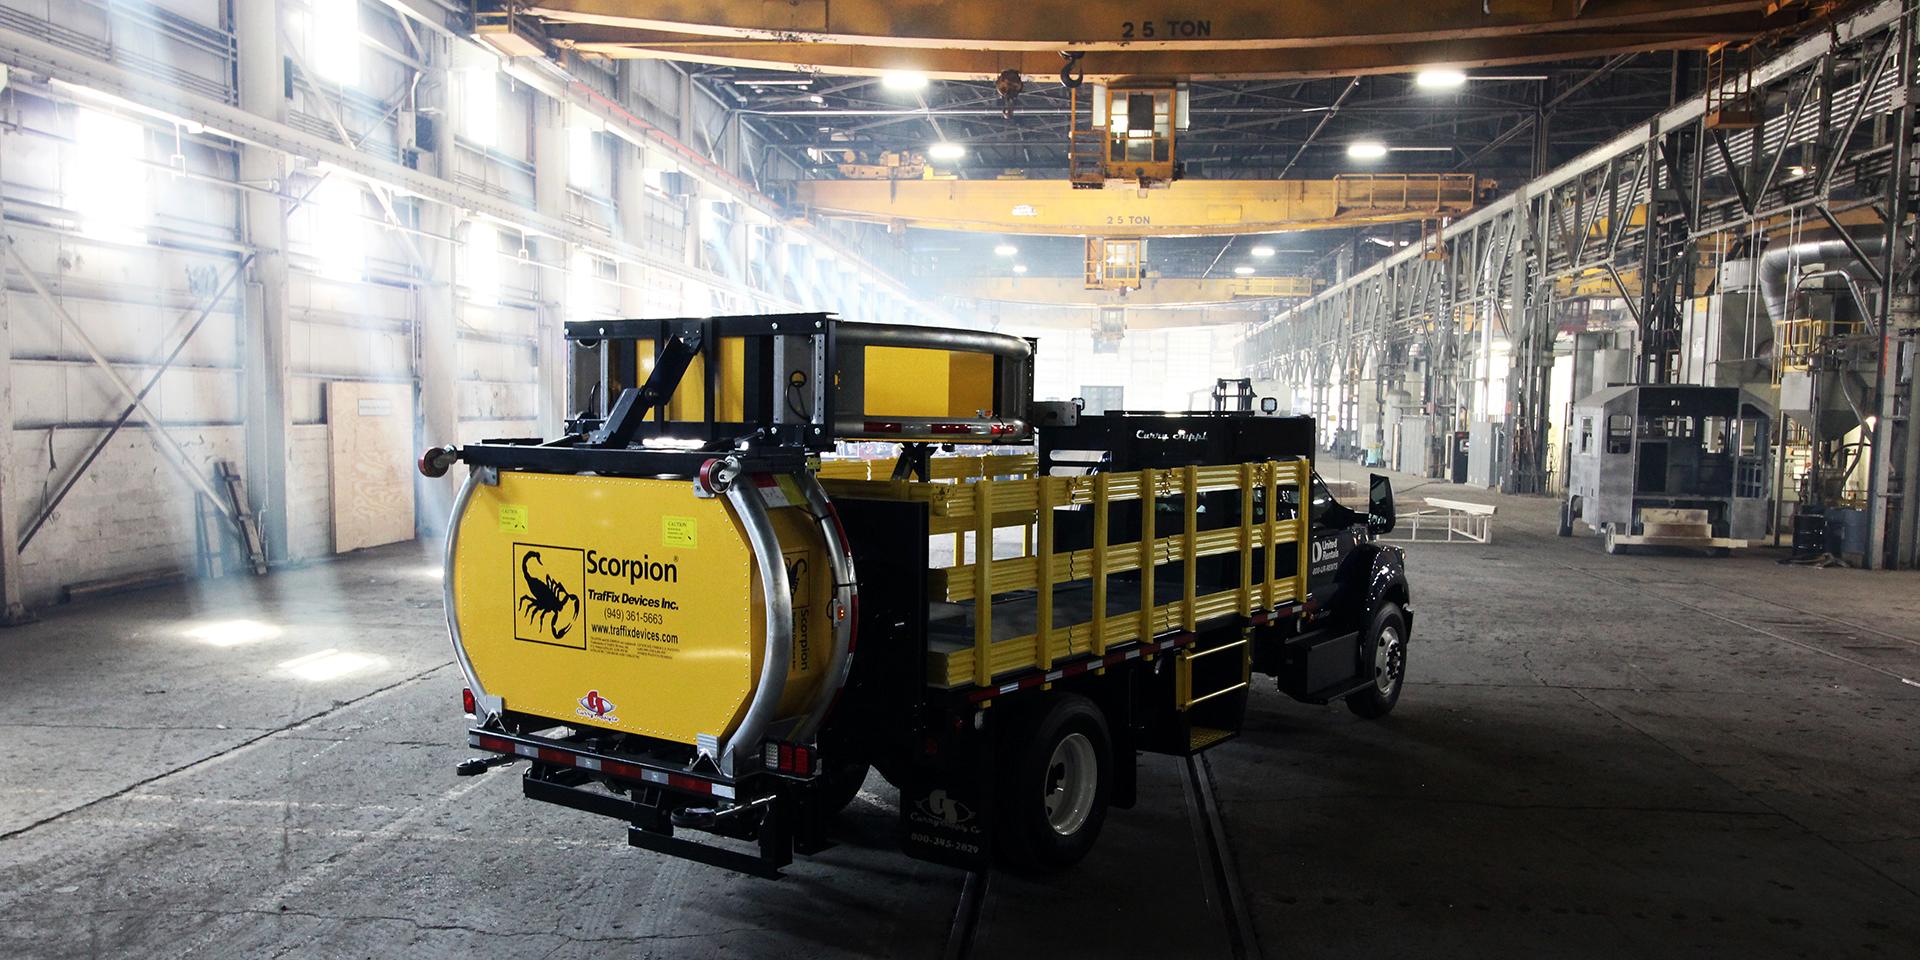 Curry Supply Scorpion truck